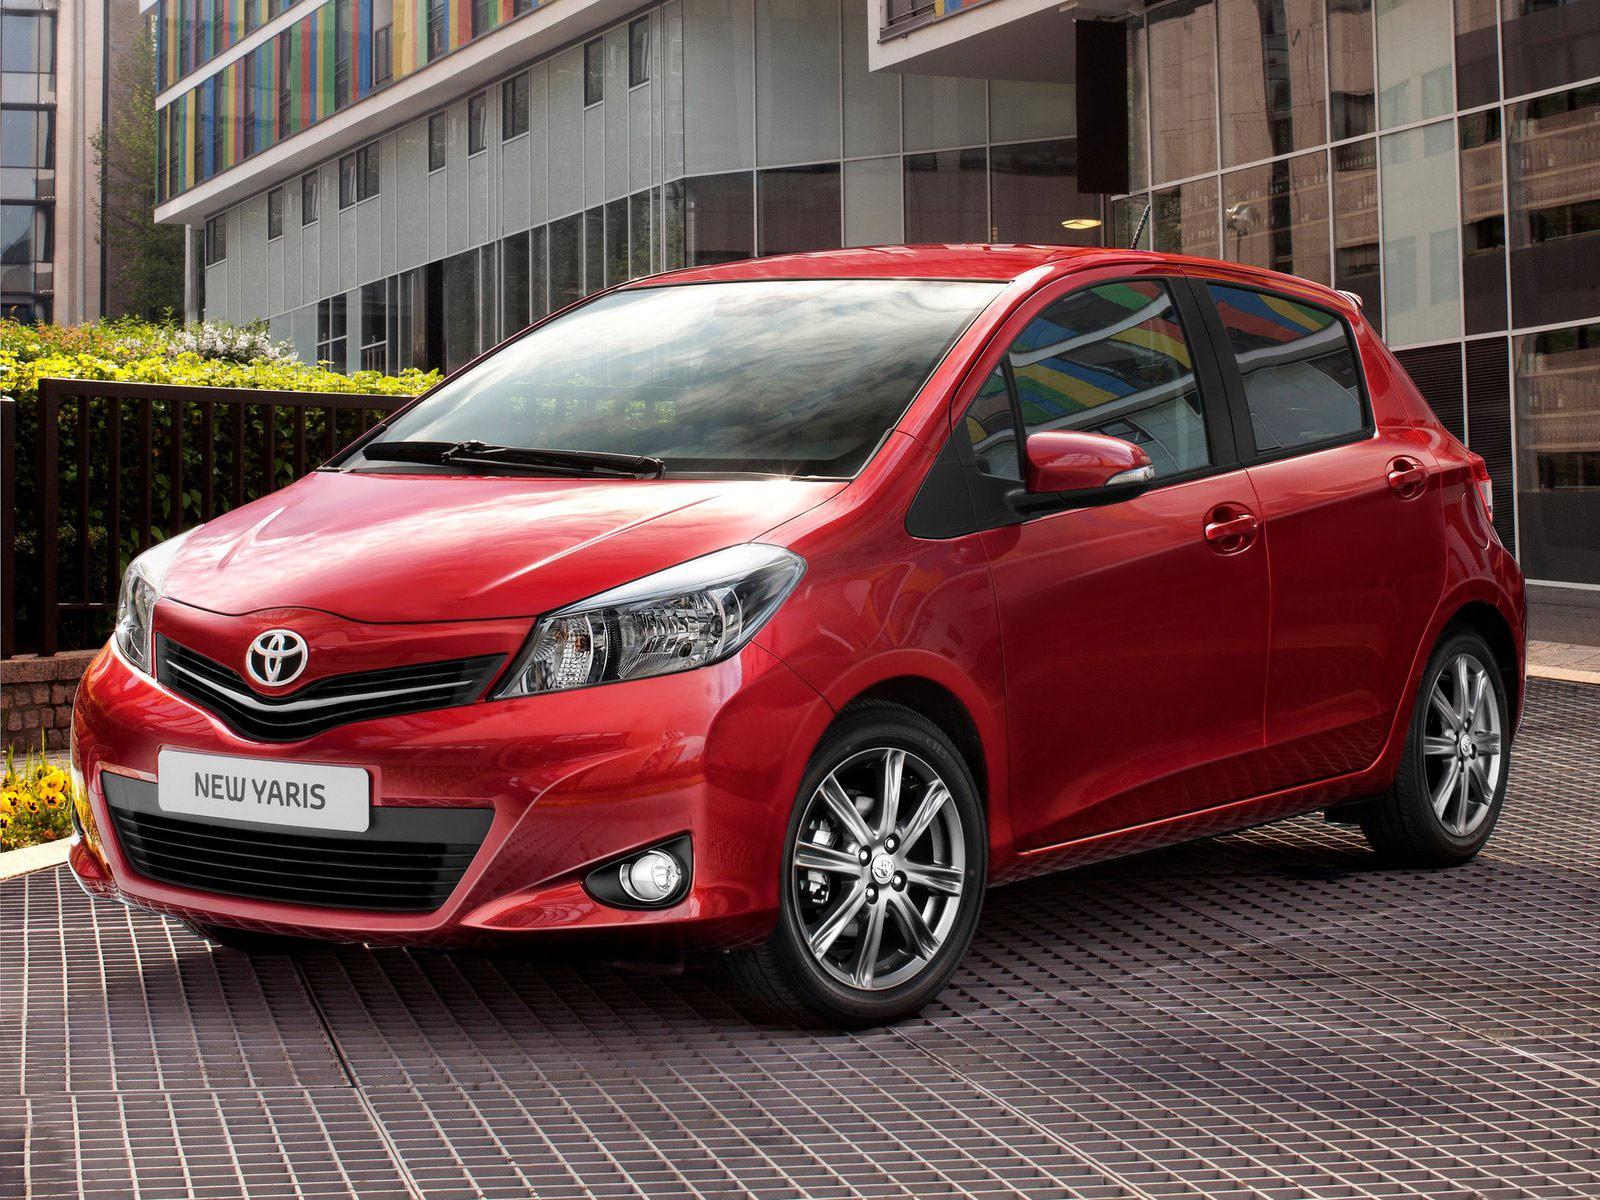 car insurance information 2012 toyota yaris